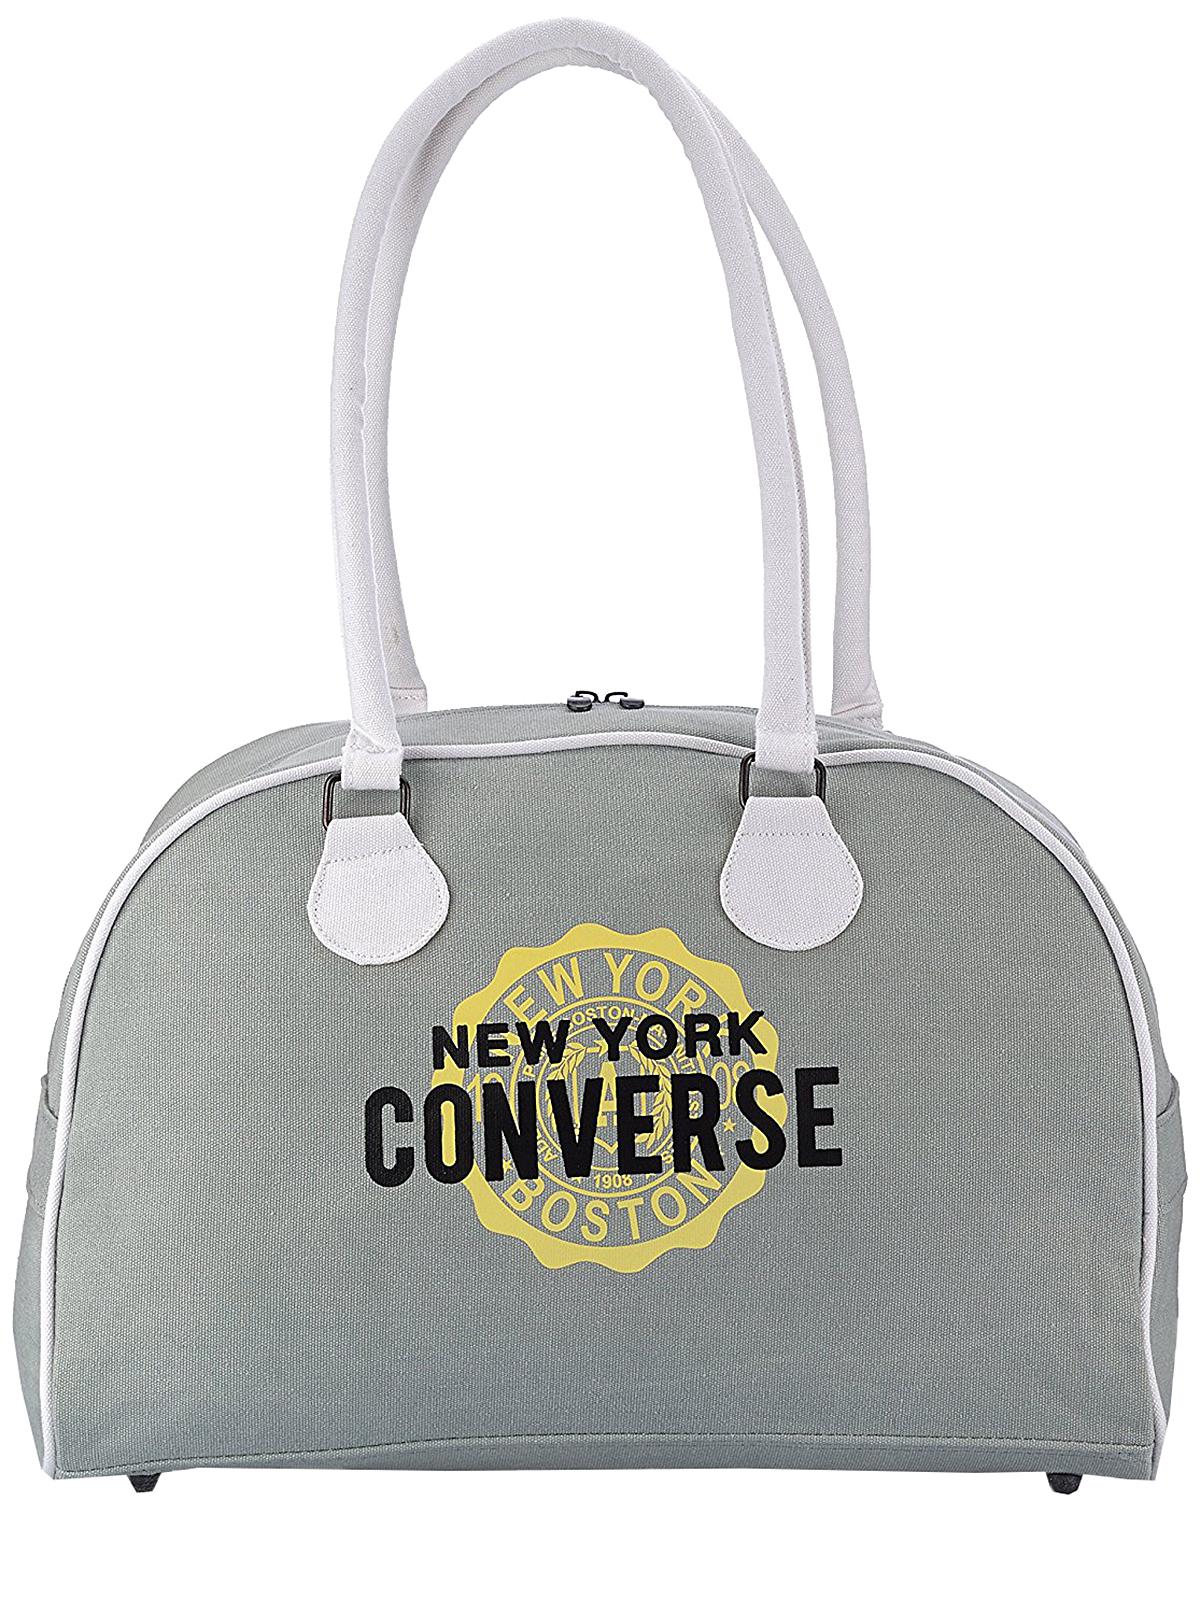 c04dd213368f Converse Tasche Bowler Shopper grau Damen Handtasche Grau von Converse